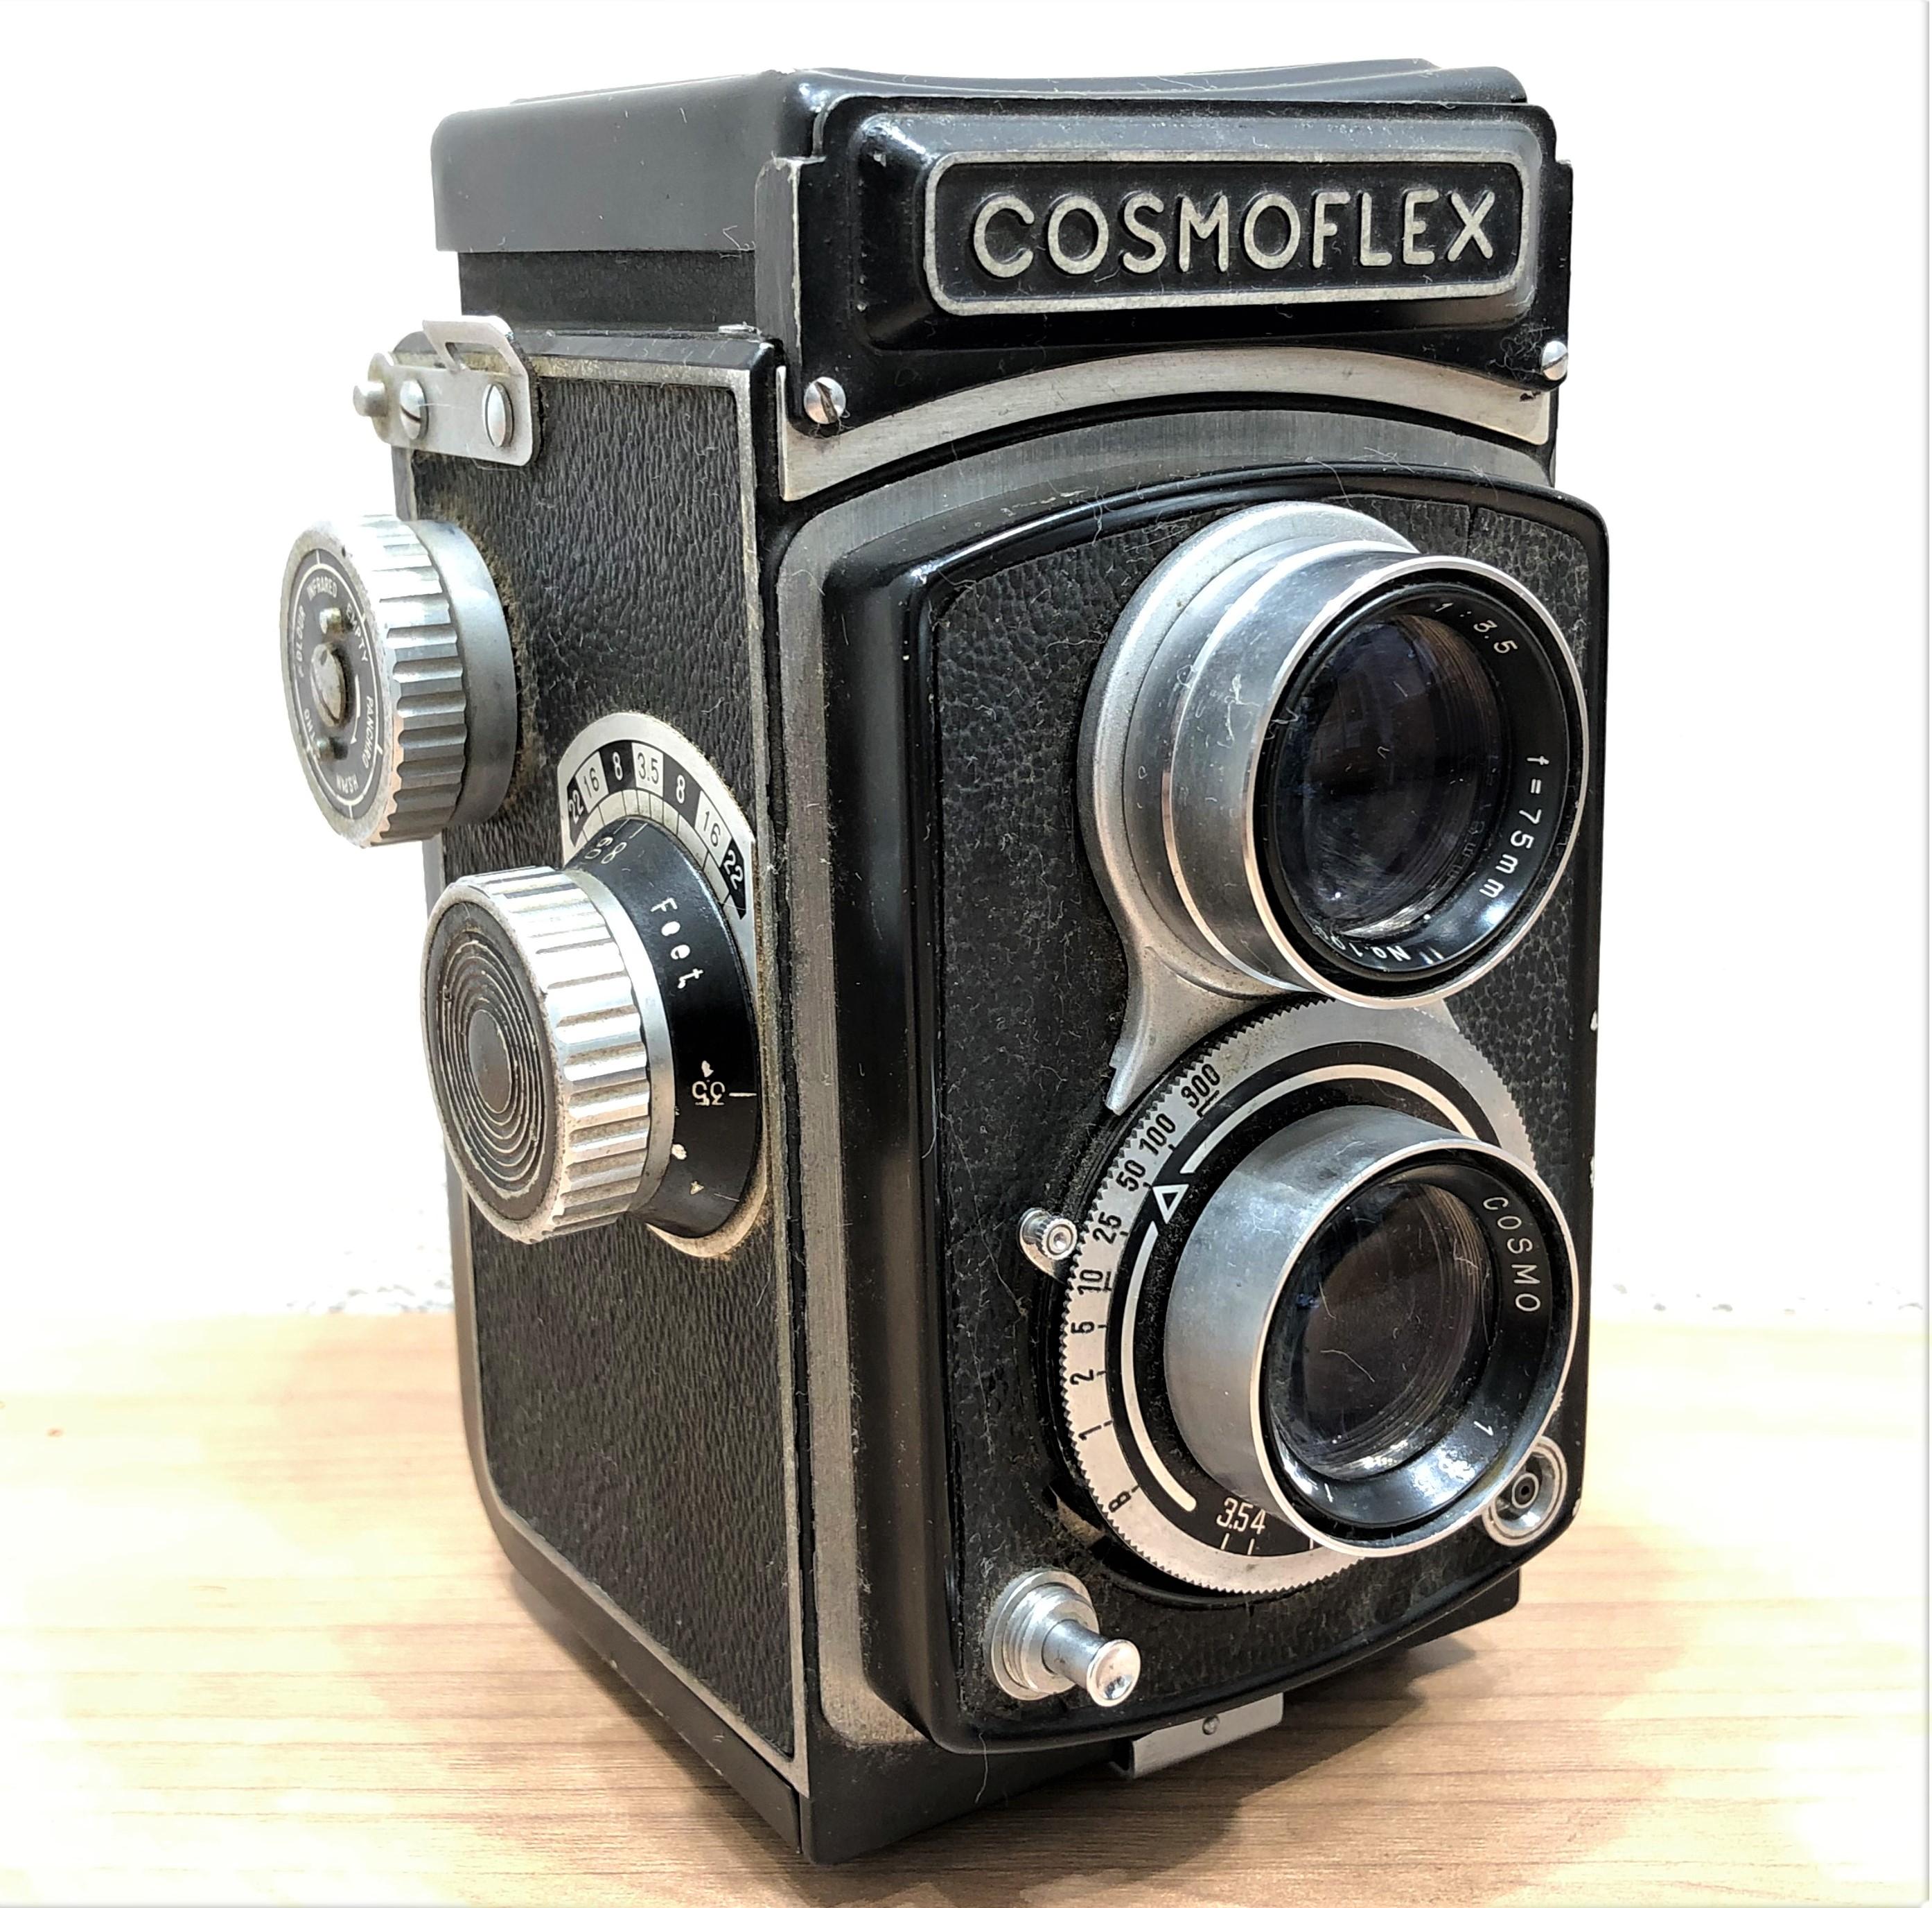 【COSMOFLEX/コスモフレックス】1:3.5 f=75mm 二眼レフカメラ